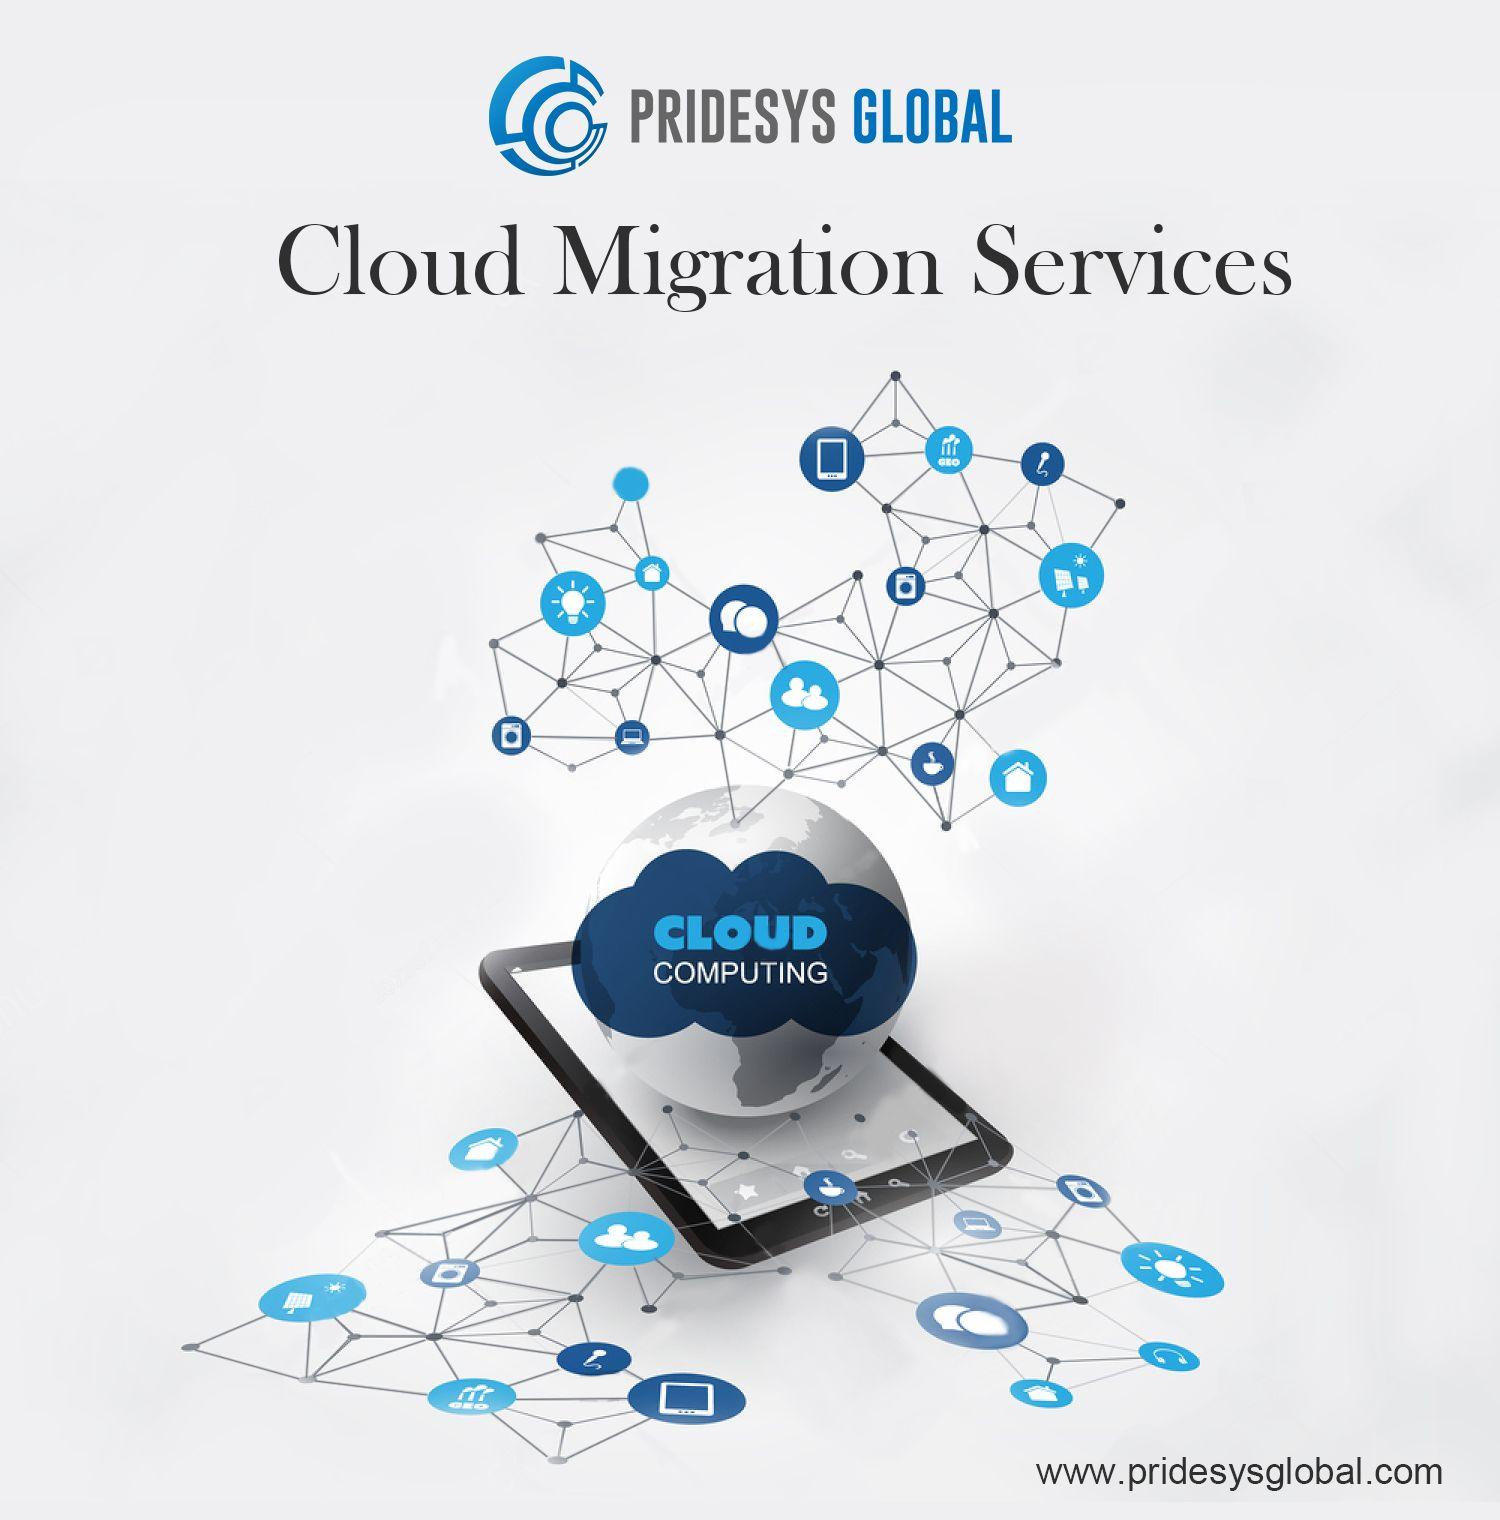 Across the globe, enterprise and publicsector